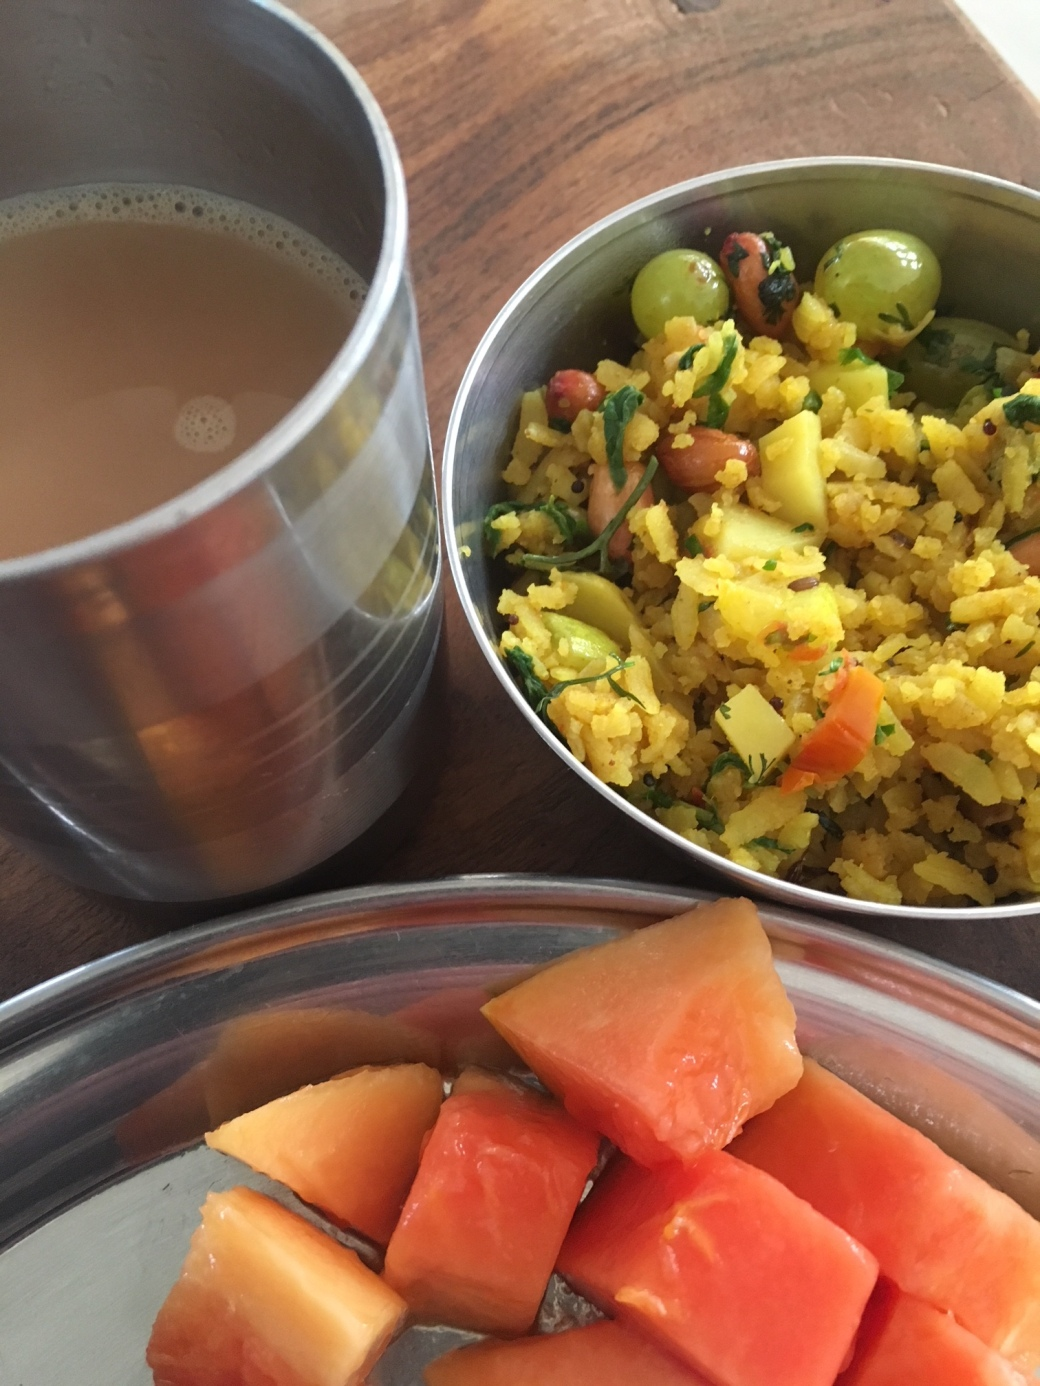 I_Breakfast!.jpg